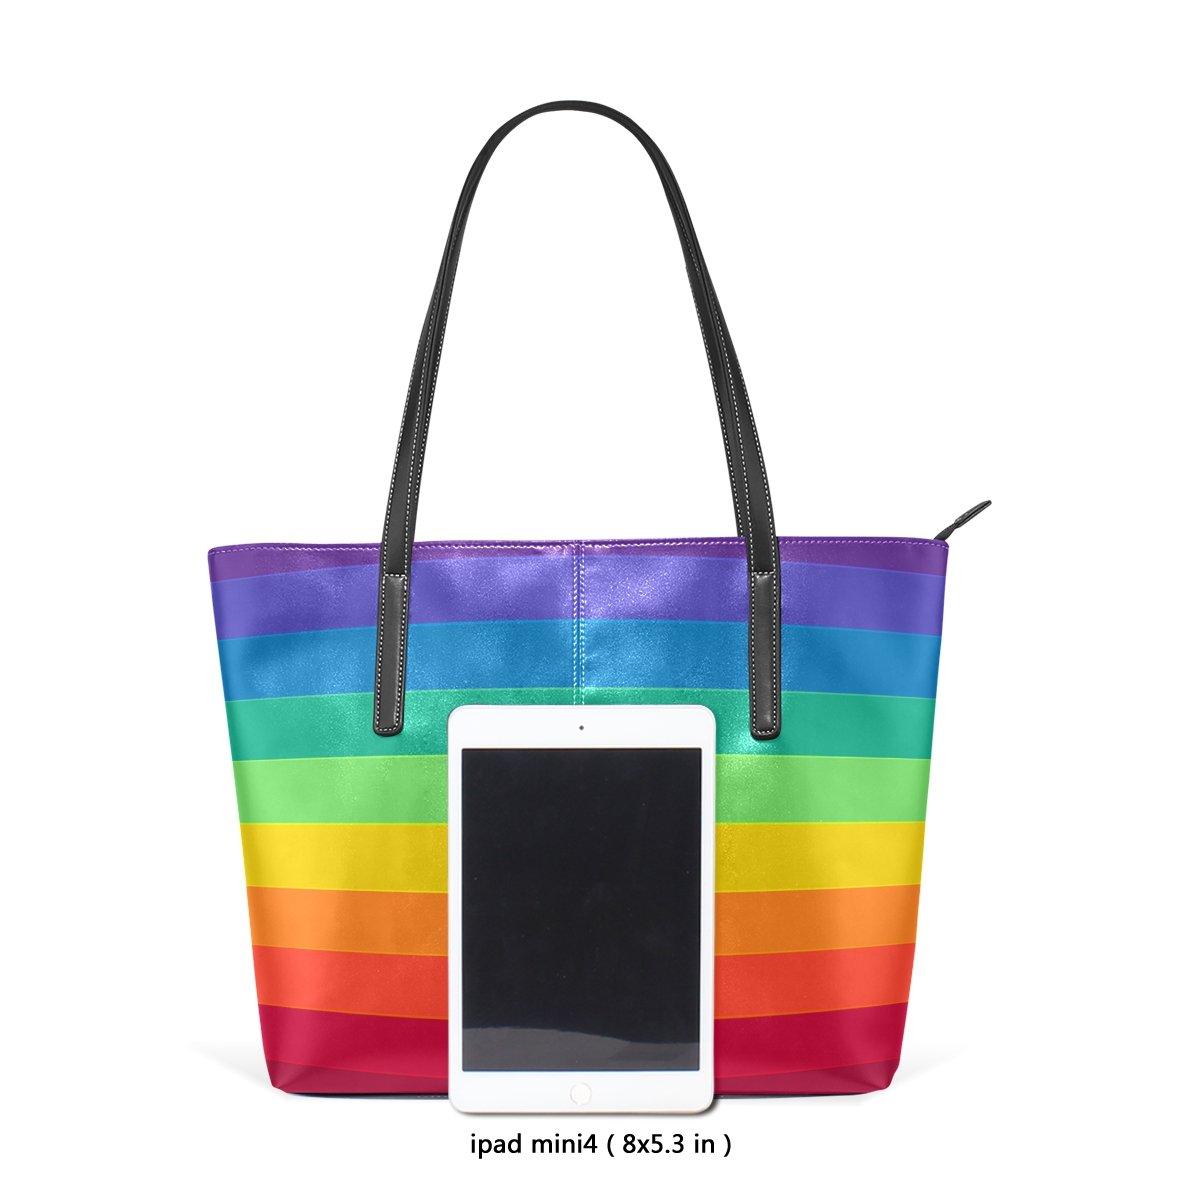 WellLee Beach Travel Totes Striped Rainbow PU Leather Shoulder Handbag for Women Girls